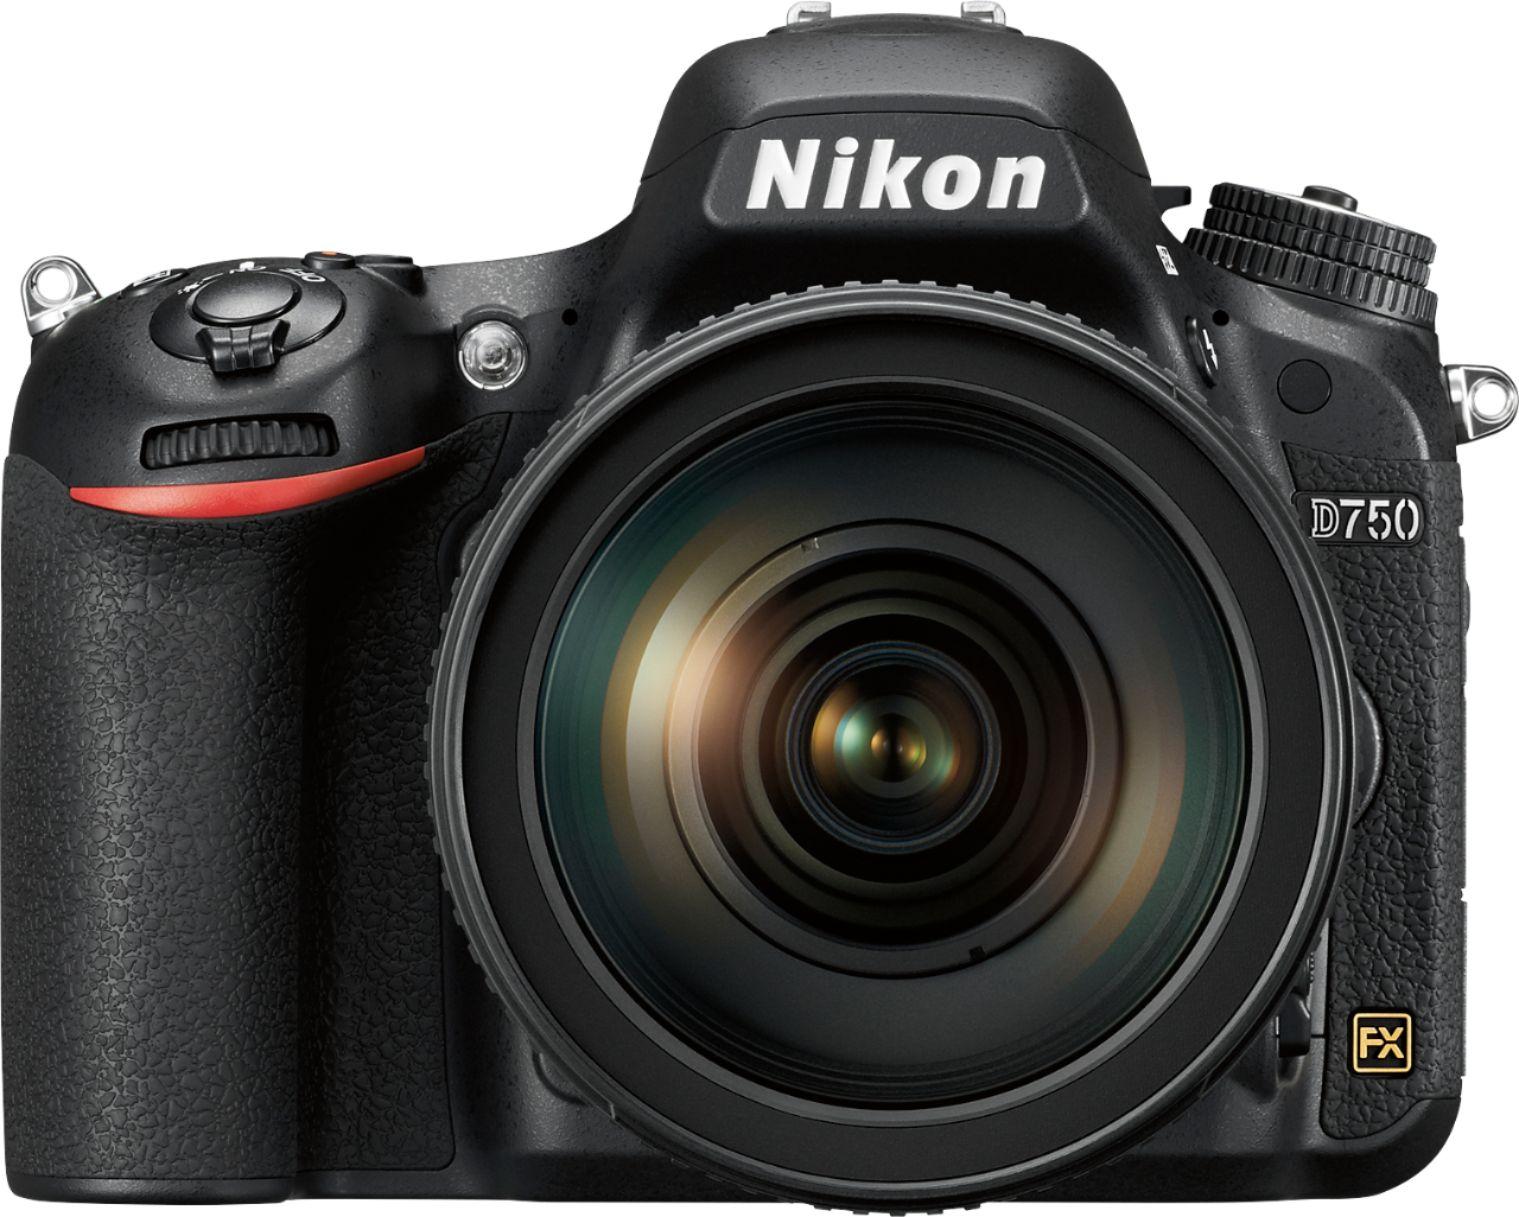 Nikon - 24.3 Megapixel Digital SLR Camera with Lens - 24 mm-120 mm Lens - Multi